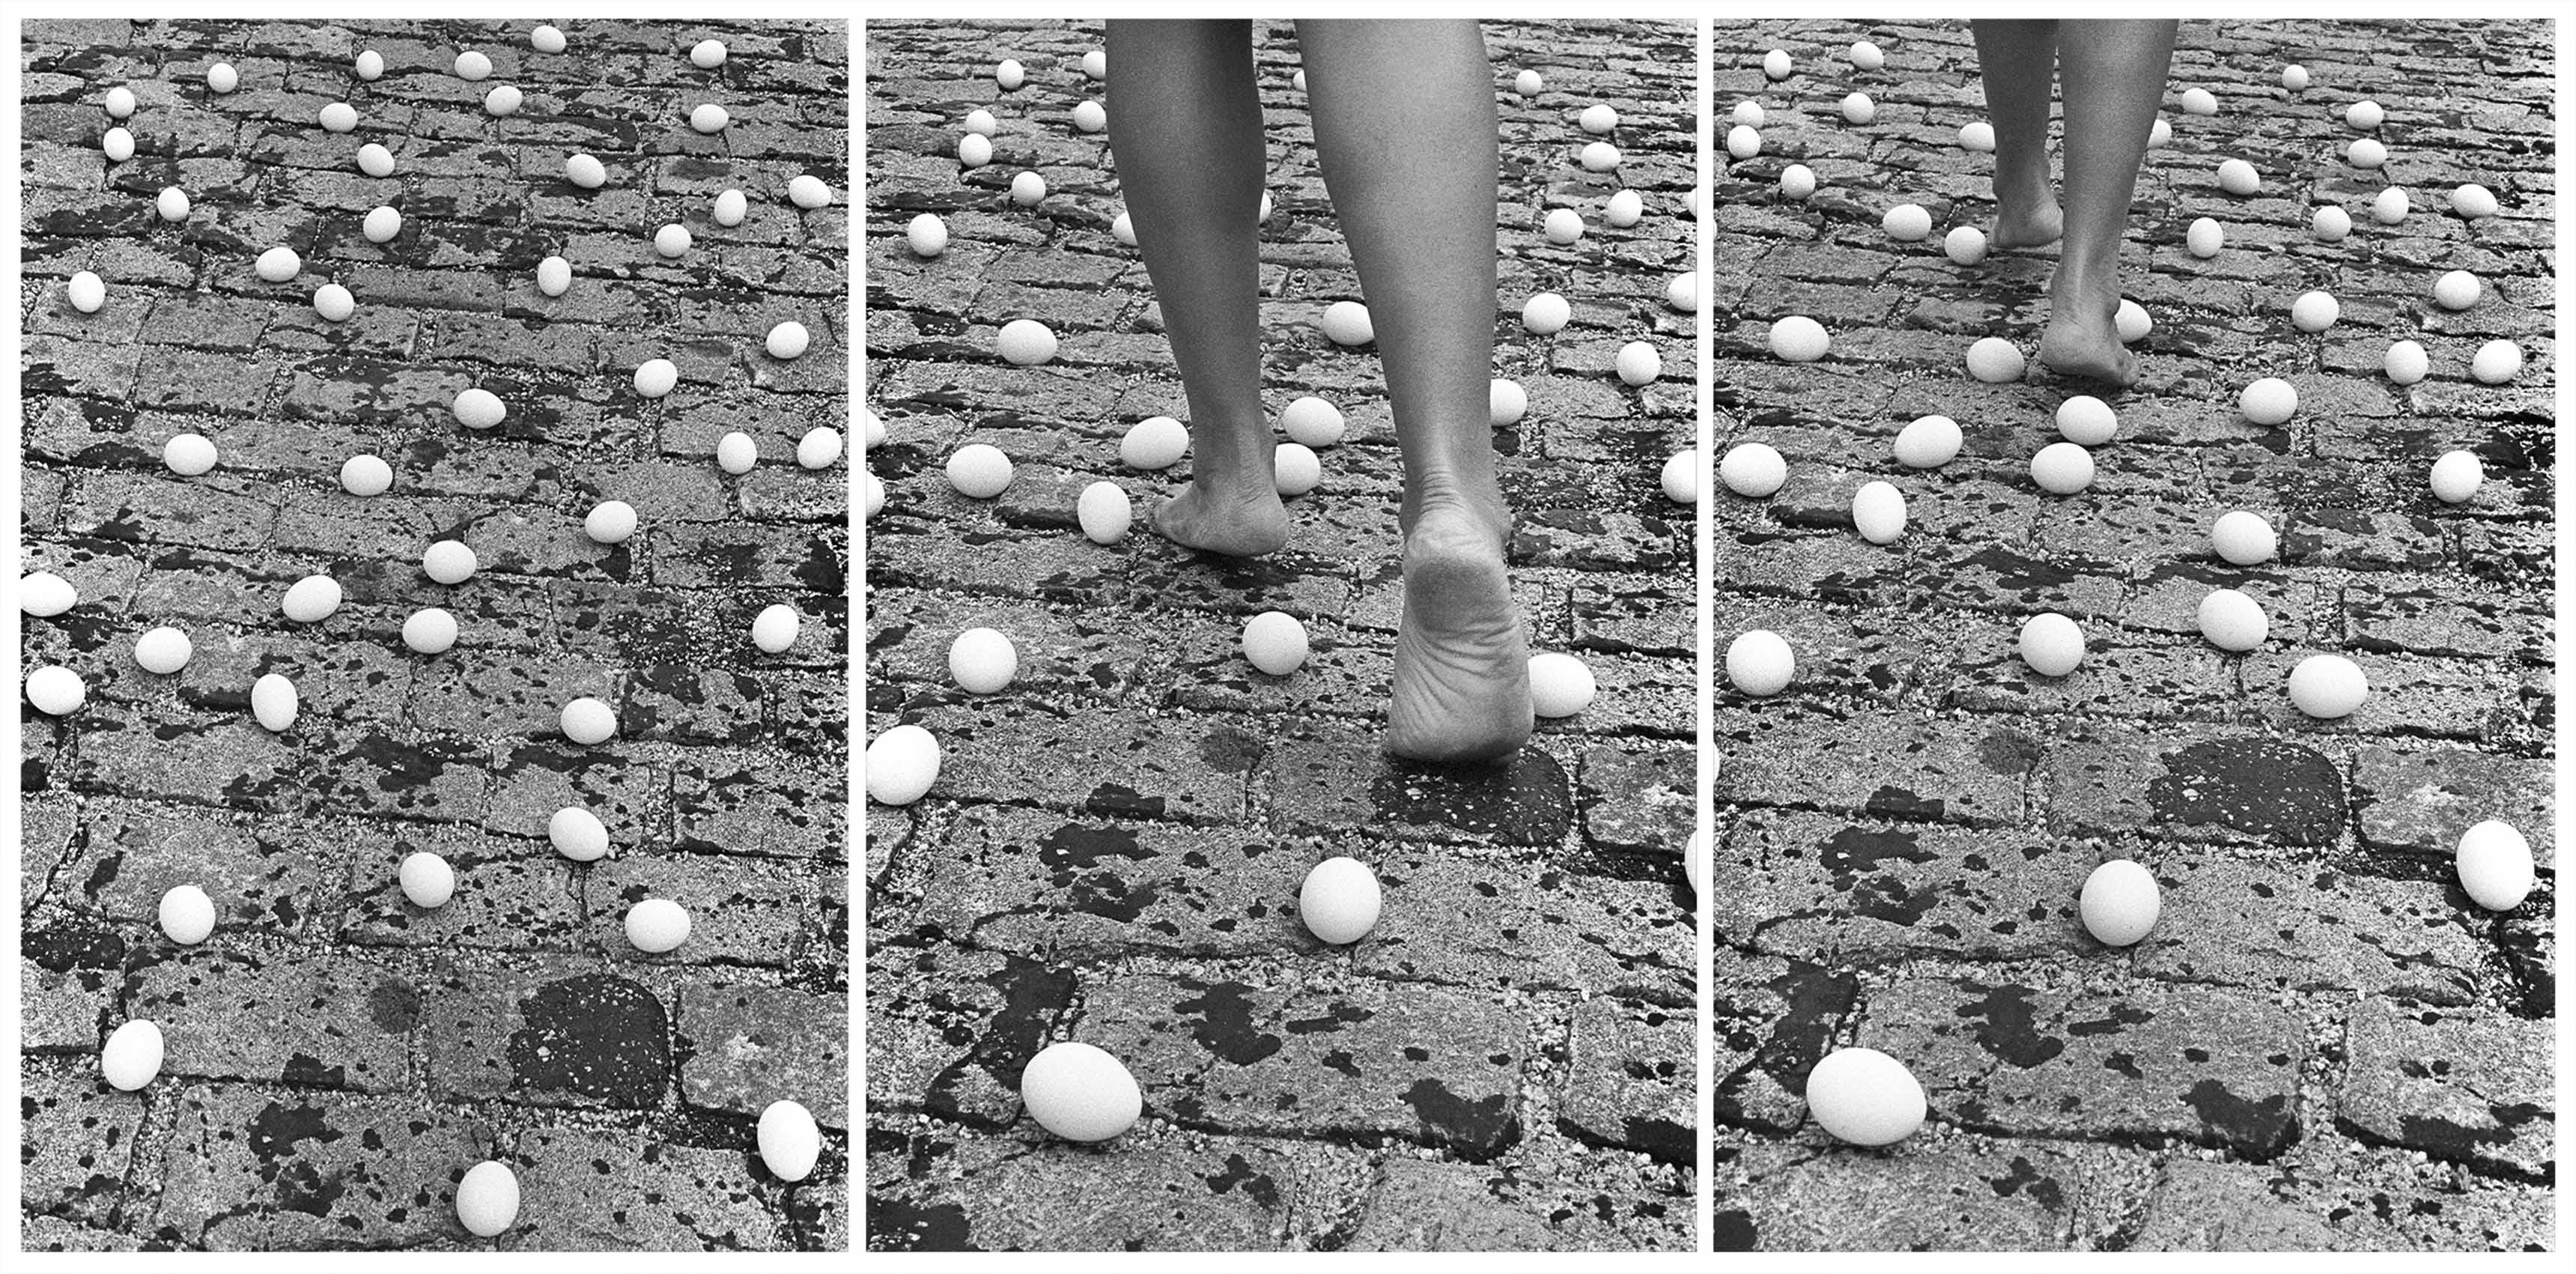 MAIOLINO Anna Maria, Entrevidas, 1981, Collection 49 Nord 6 Est - Frac Lorraine, Metz, ©A. M. Maiolino